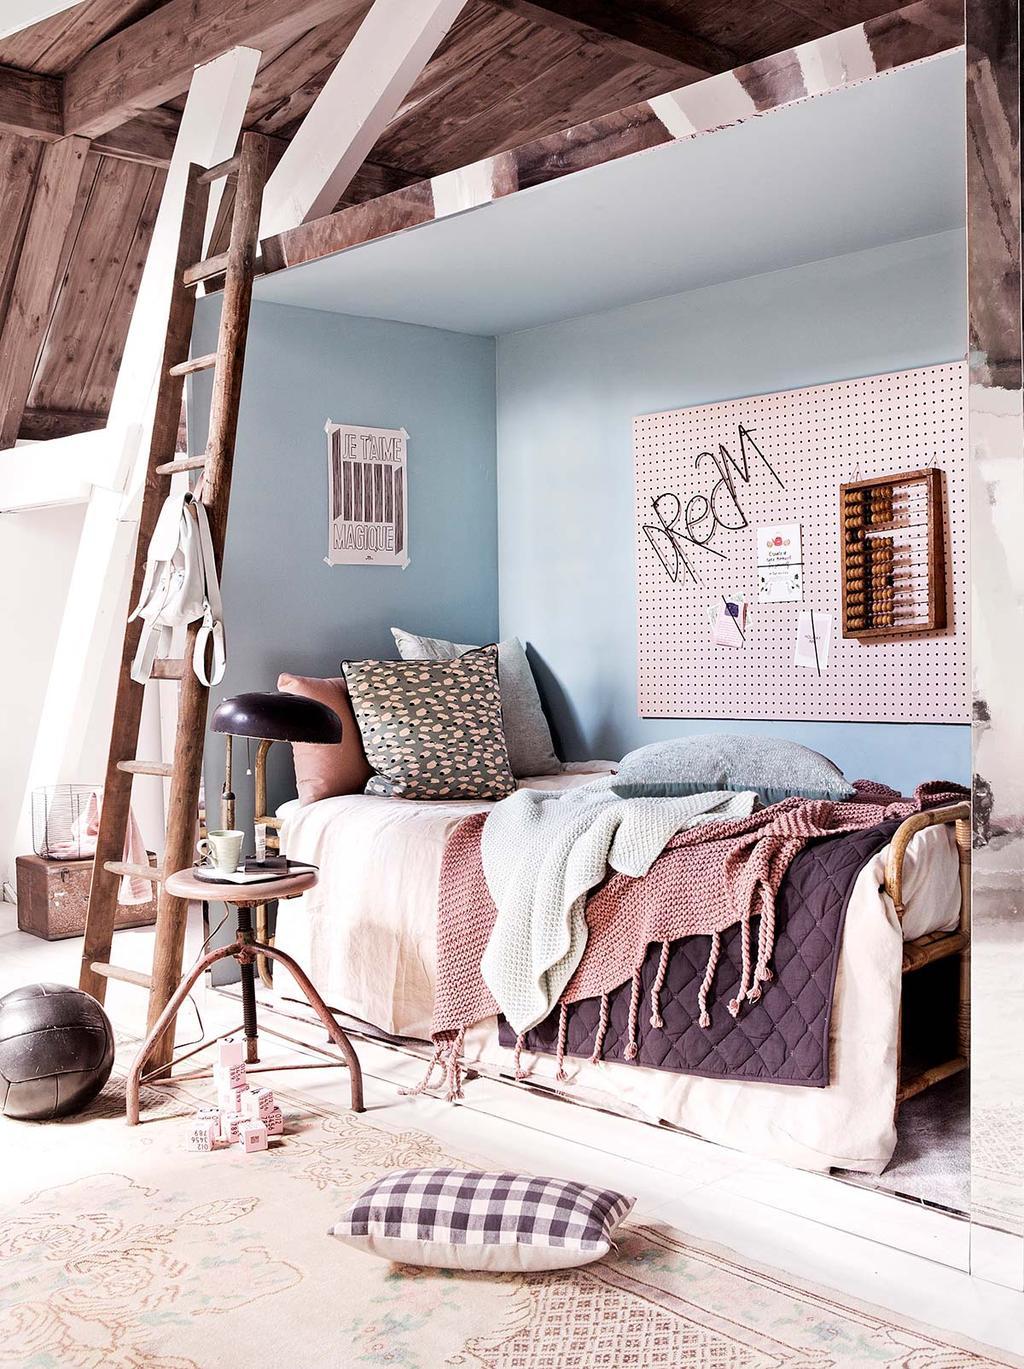 Kinderkamer met bedstede en vintage elementen DIY wandbord